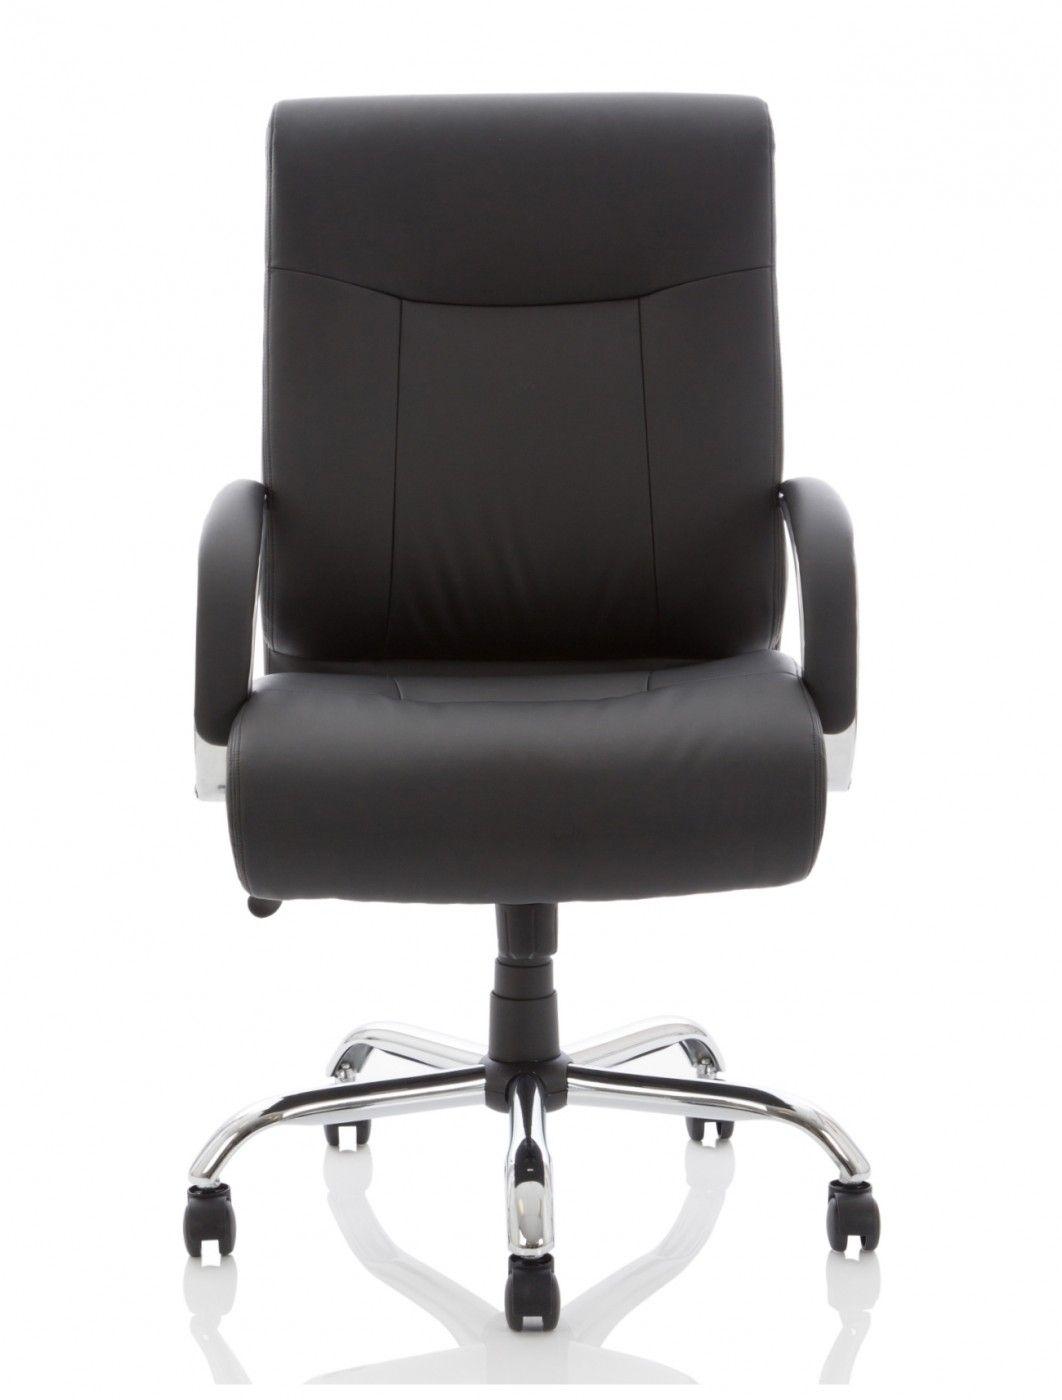 Heavy Duty Leather Executive Office Chair